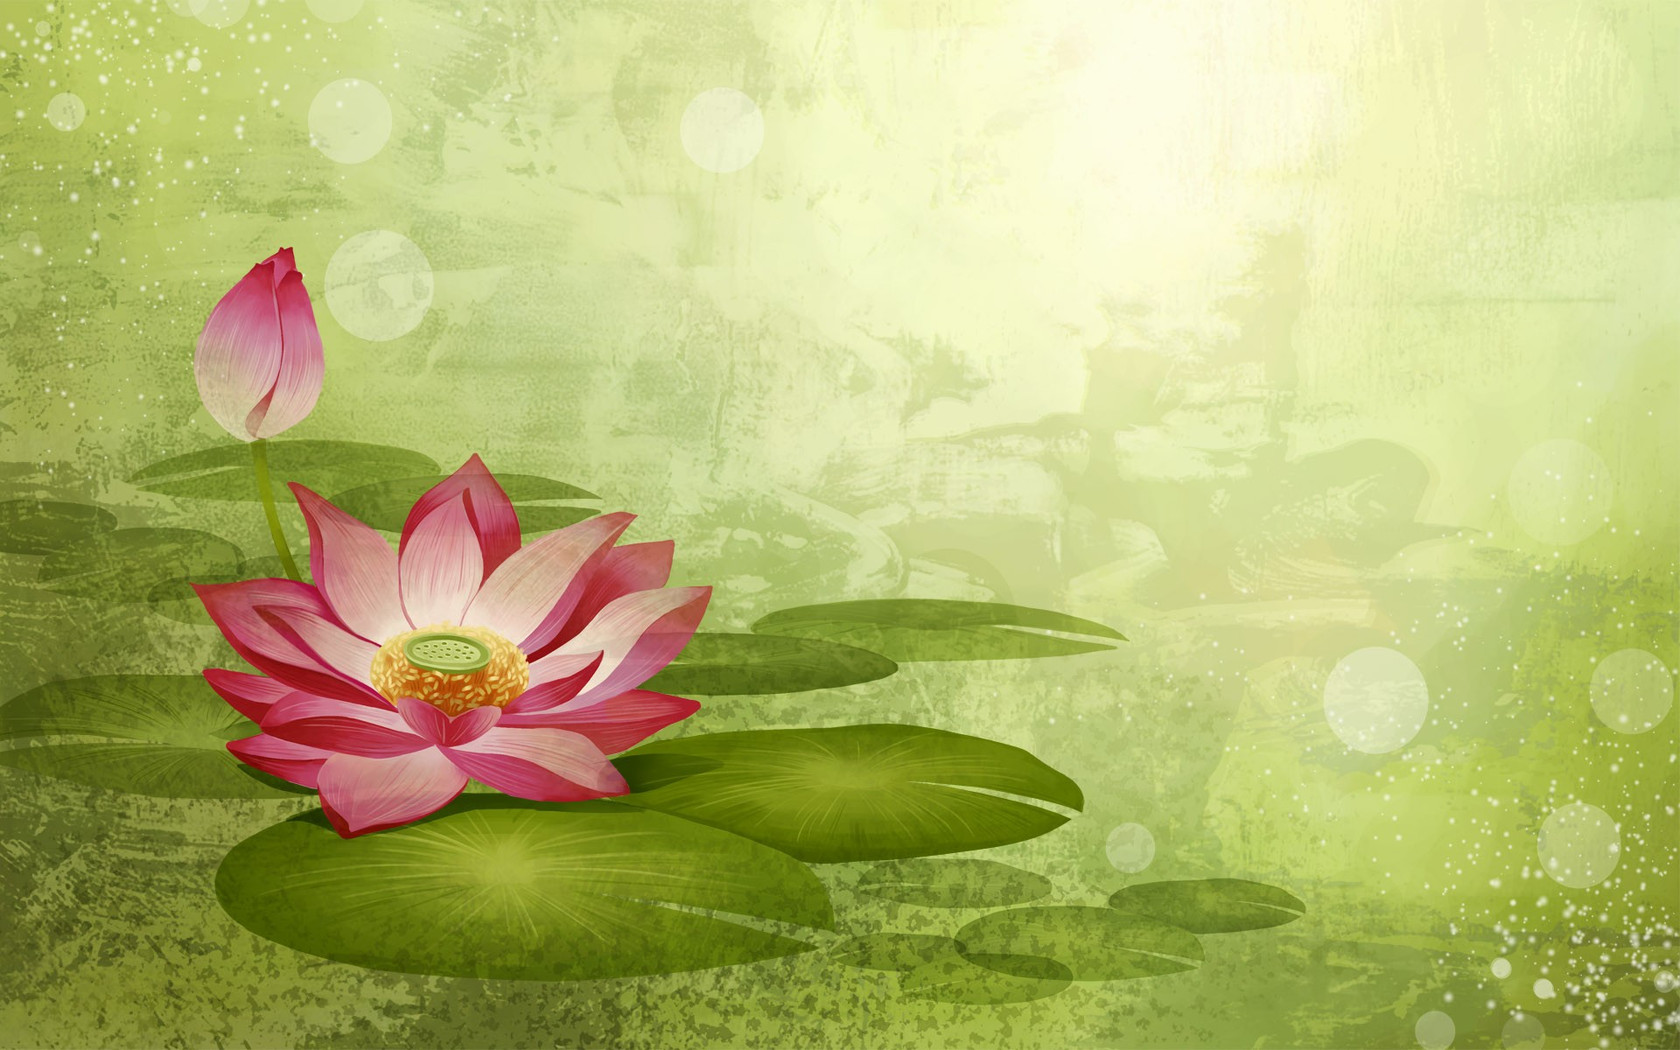 Scenery clipart lotus flower #10